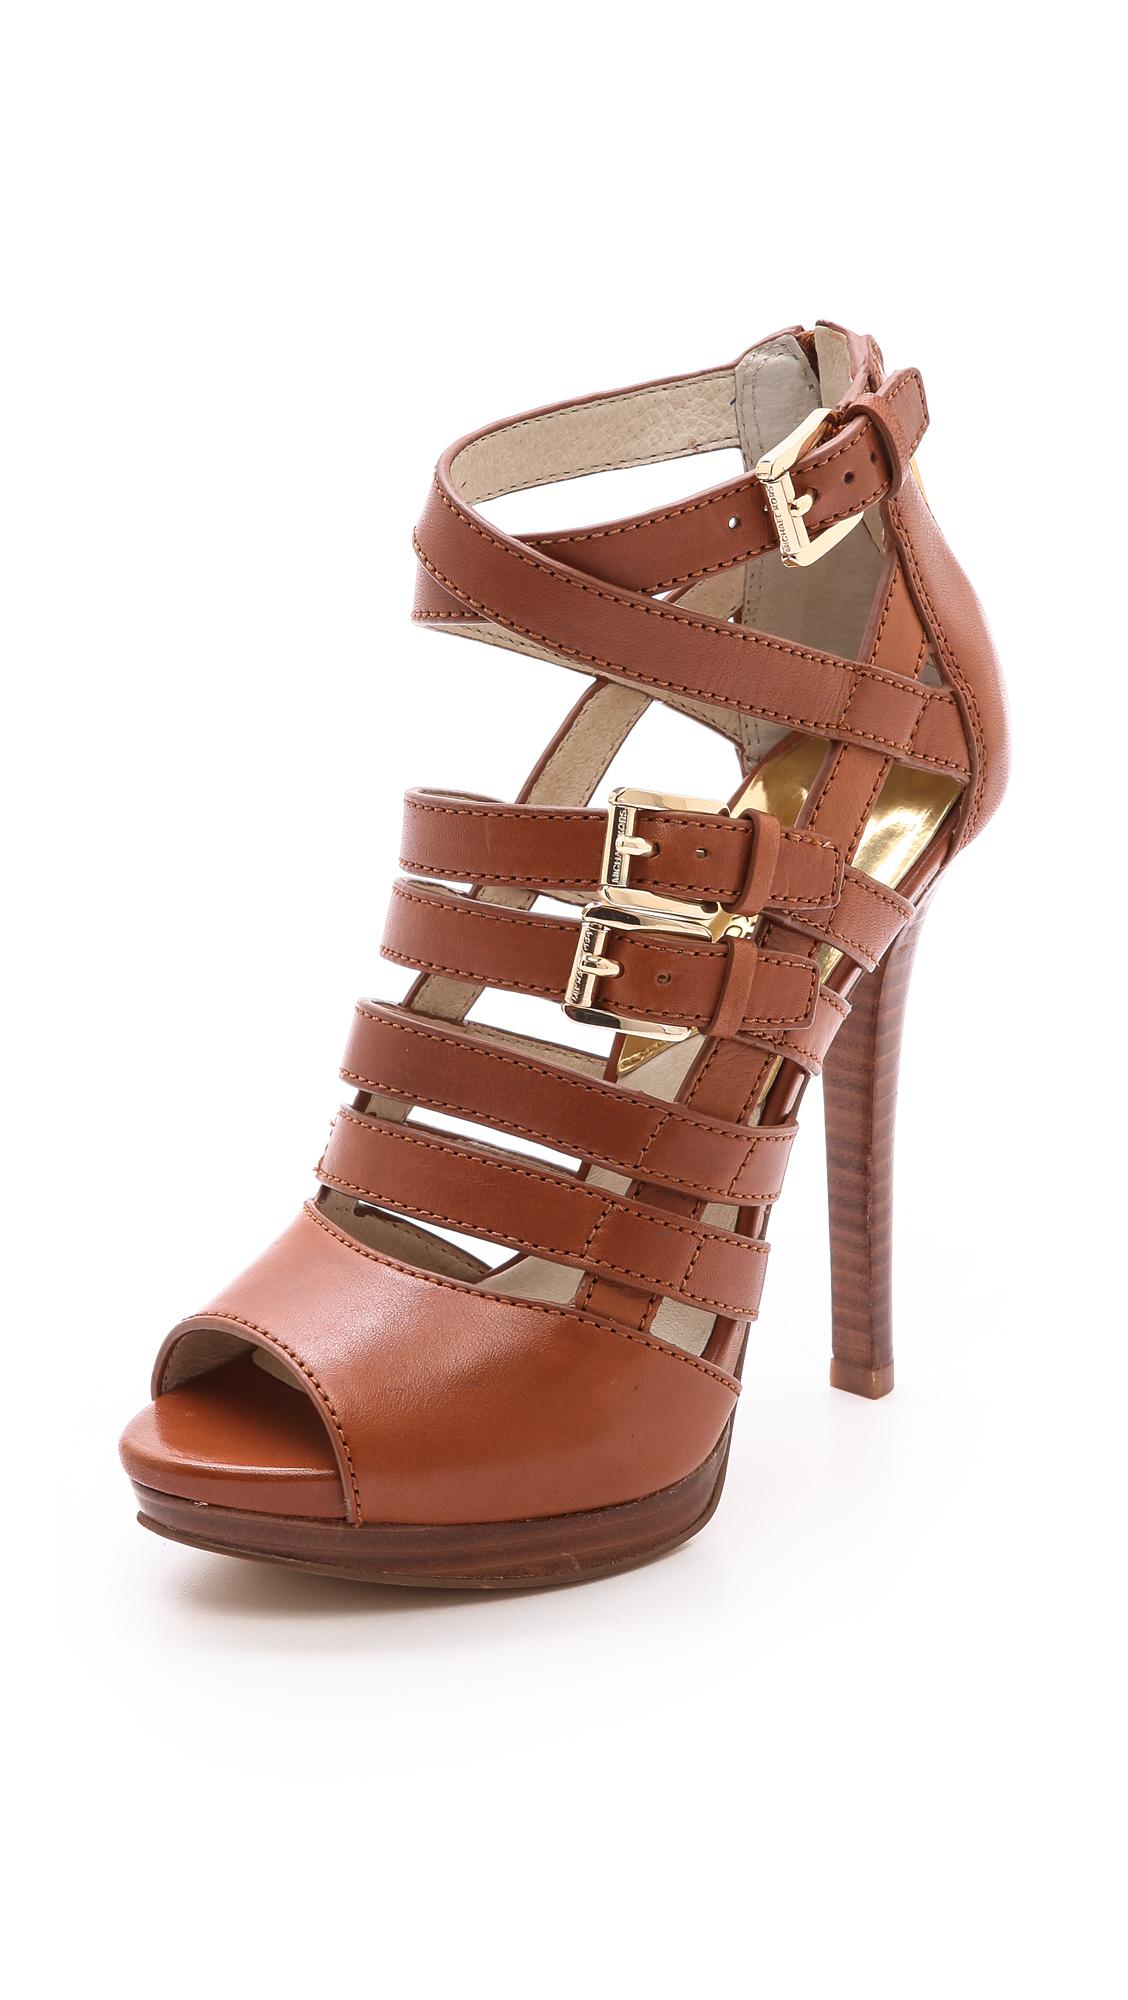 ec8e73c6ee7b Lyst - MICHAEL Michael Kors Sandra Platform Sandals Luggage in Brown